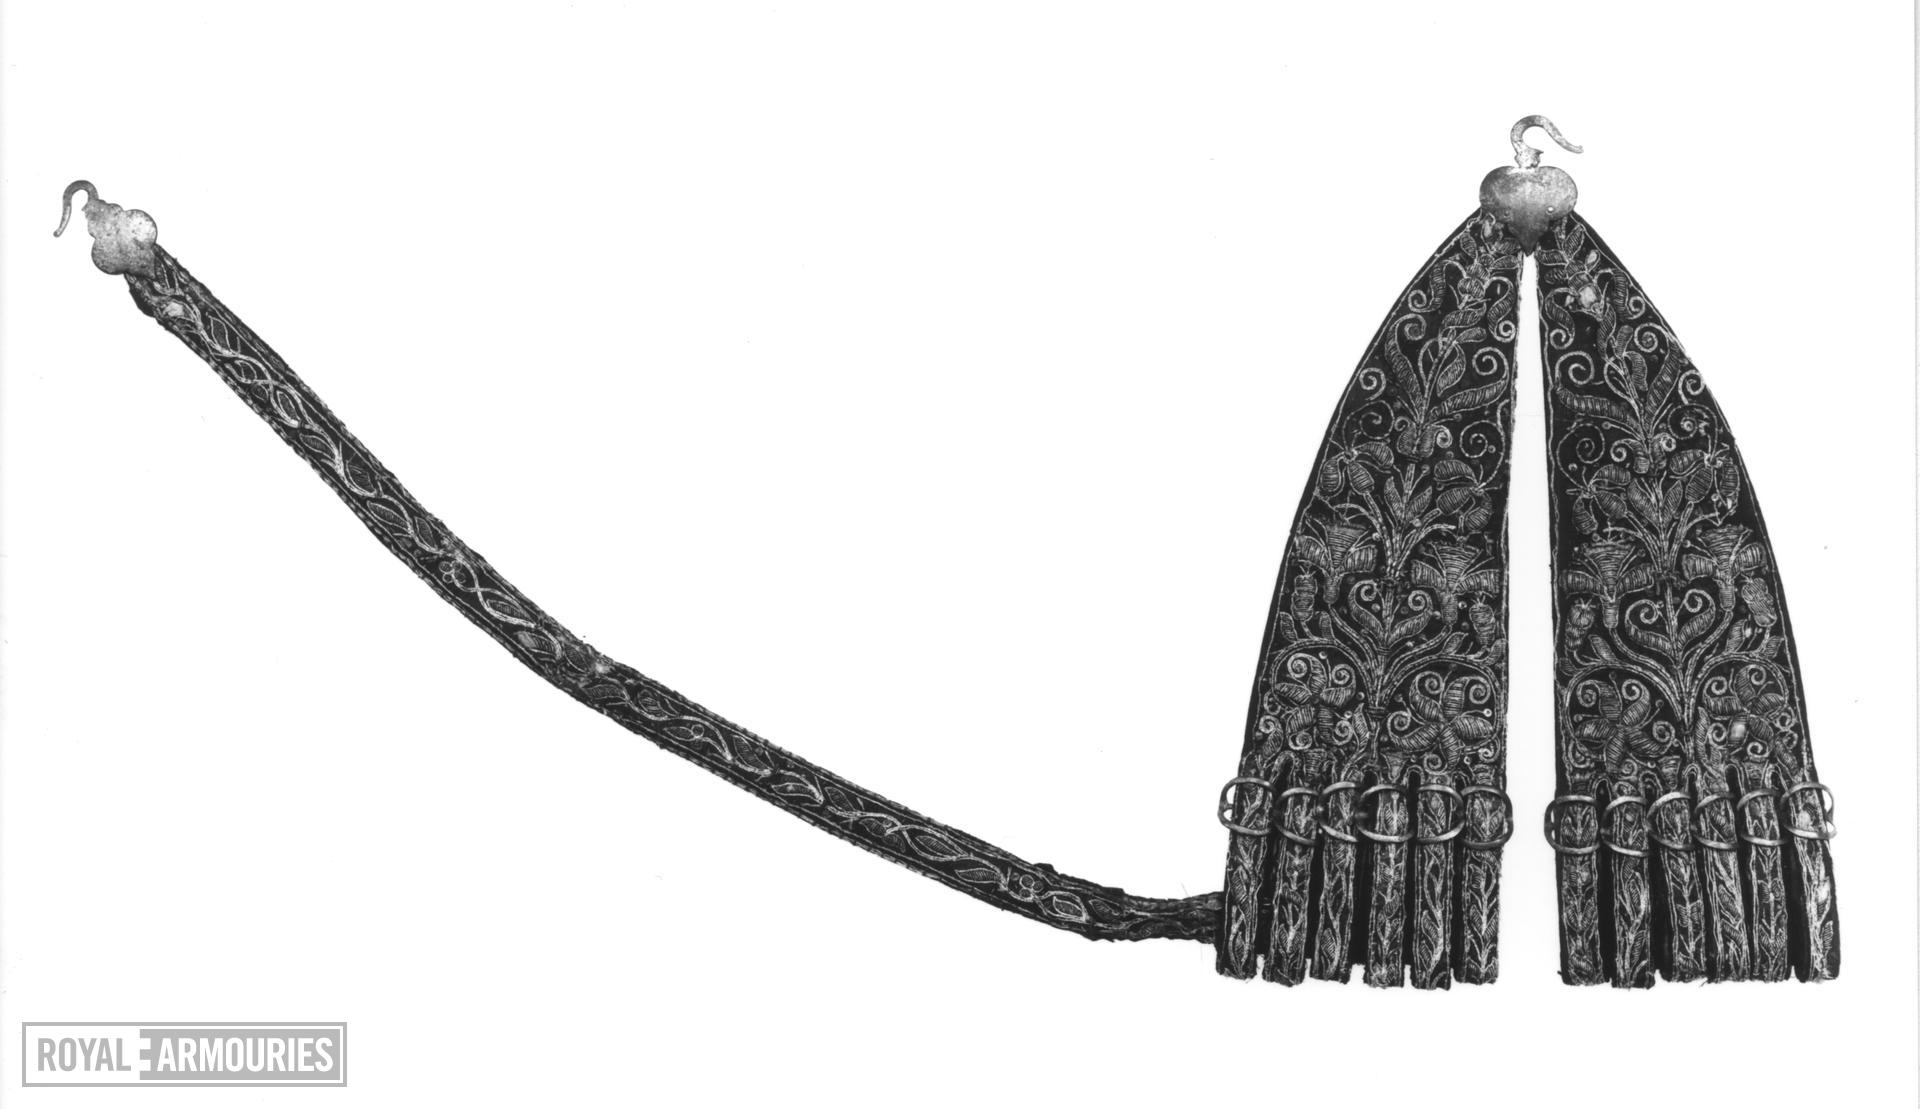 Hanger and belt